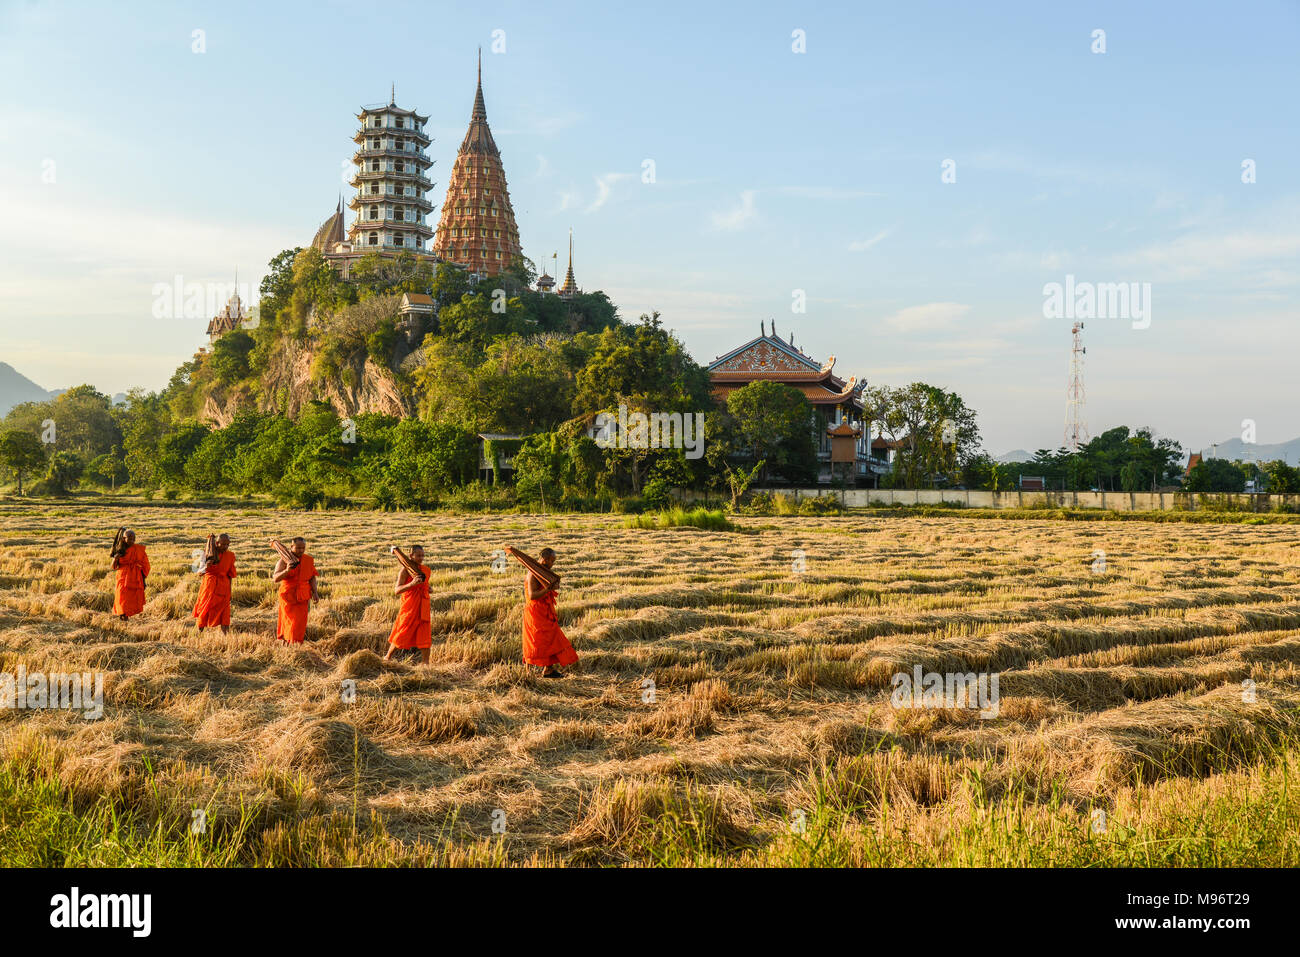 Kanchanaburi, Thailand - December 14, 2014: Monks with long-handled umbrella hiking on harvested rice farm in Kanchaburi, Thailand - Stock Image